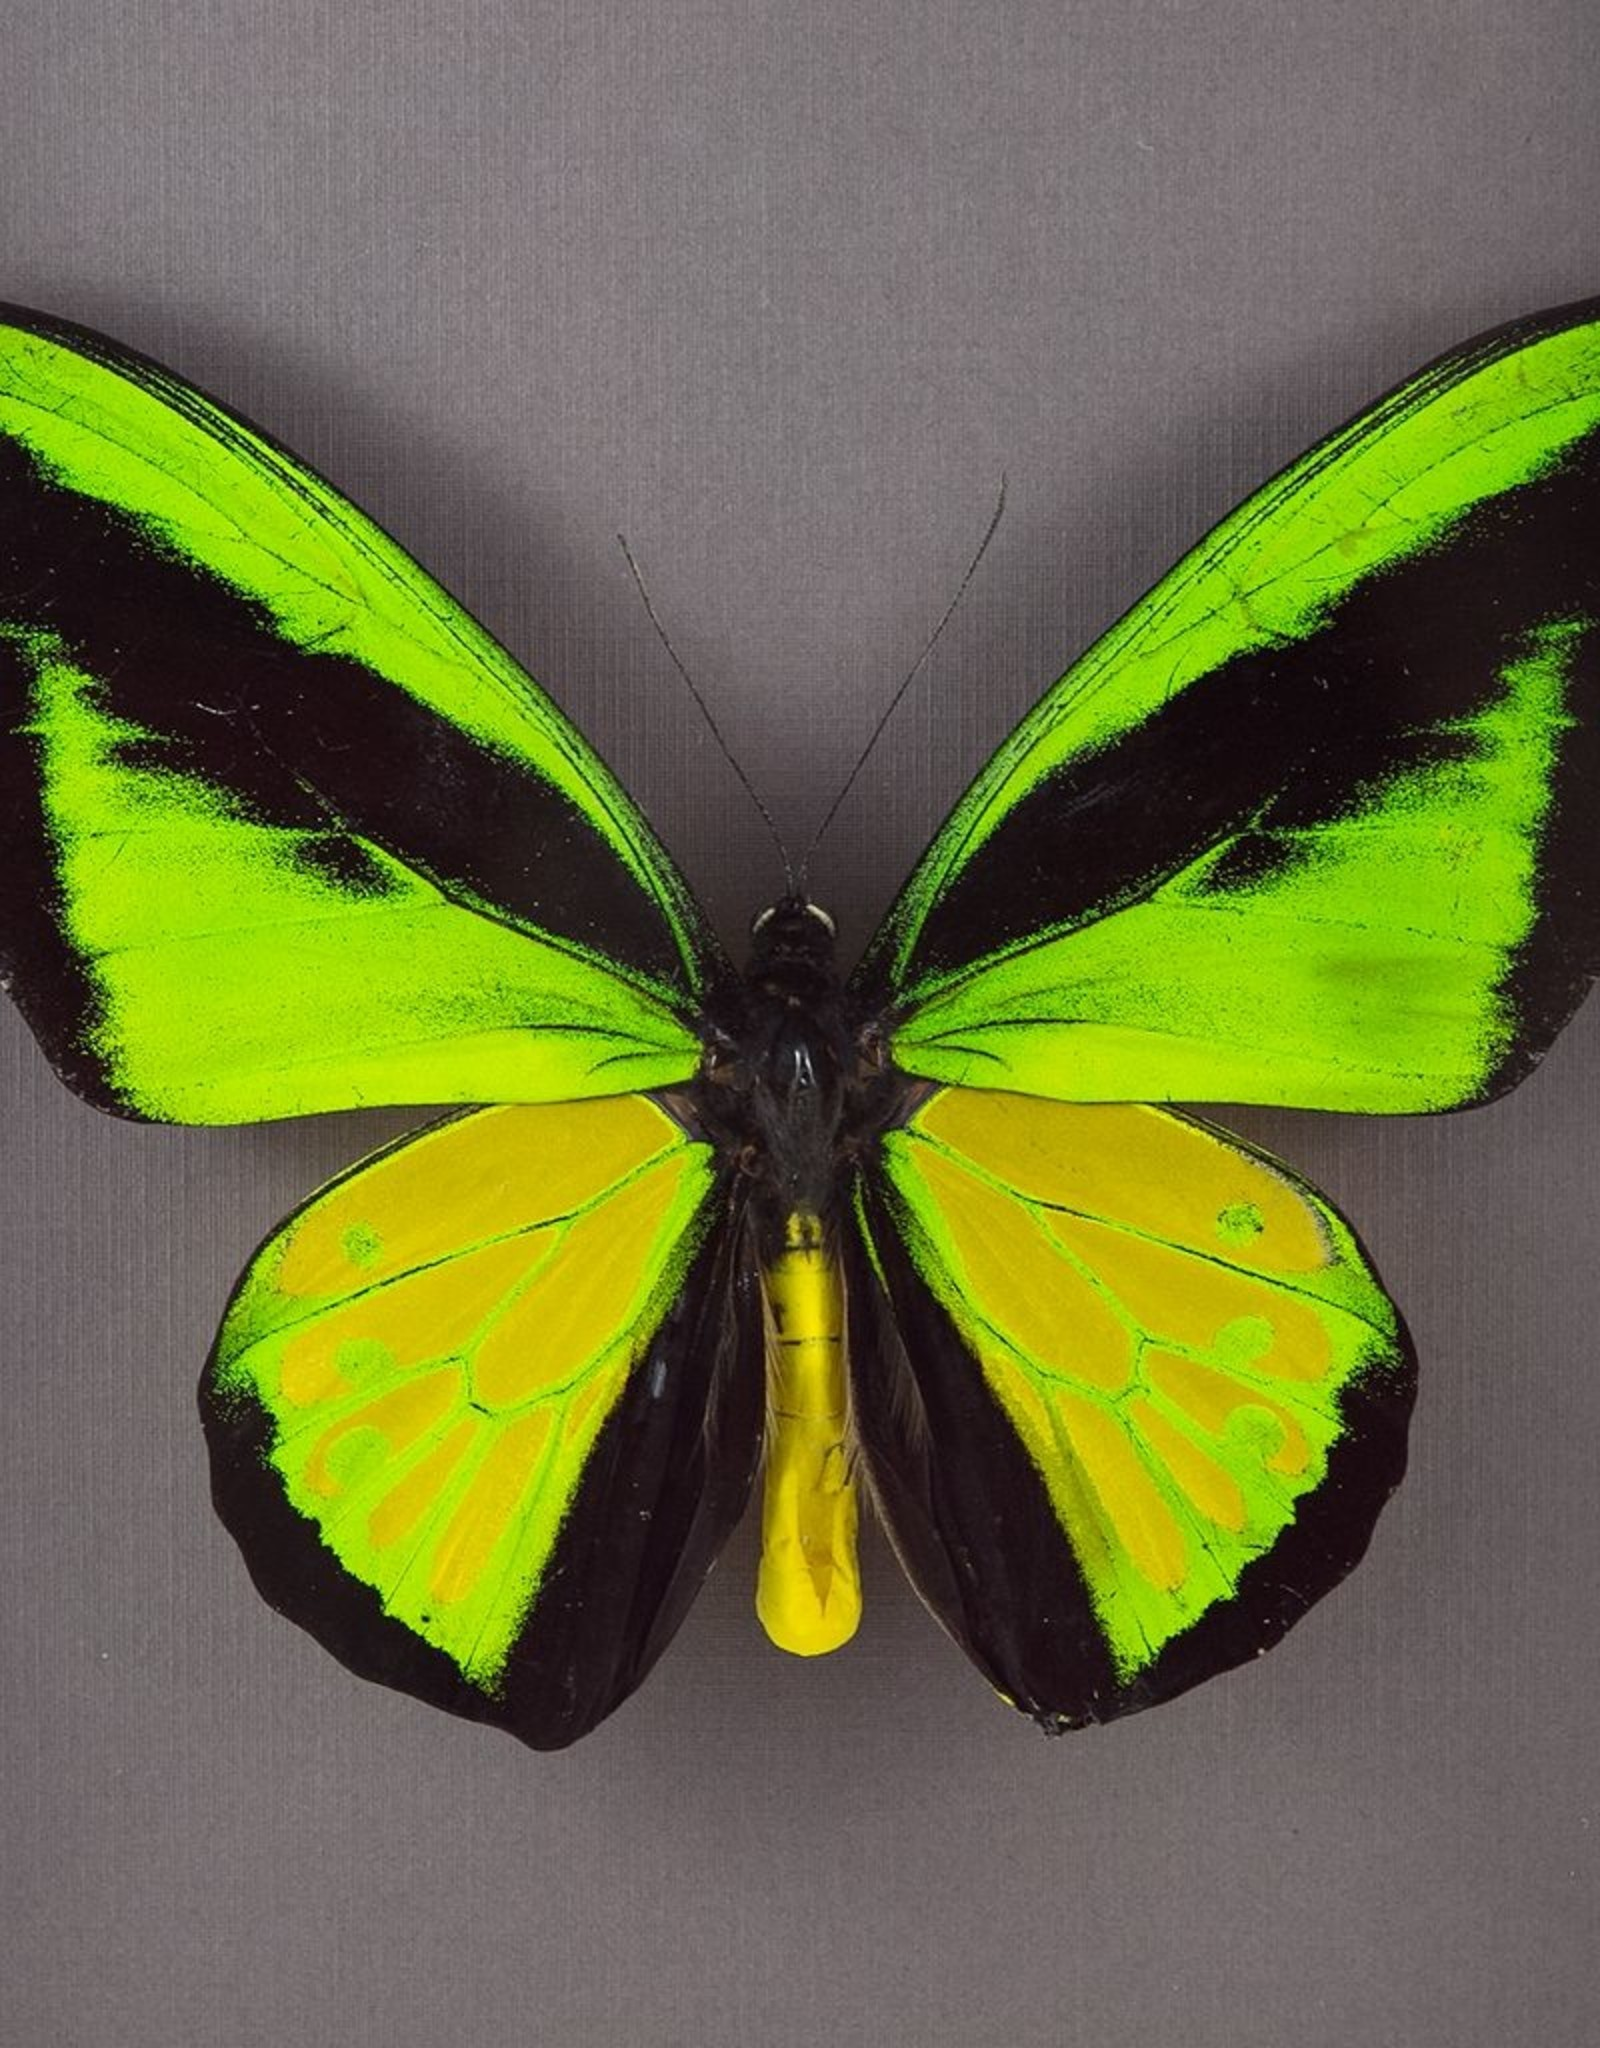 Ornithoptera goliath procus M A1 Indonesia